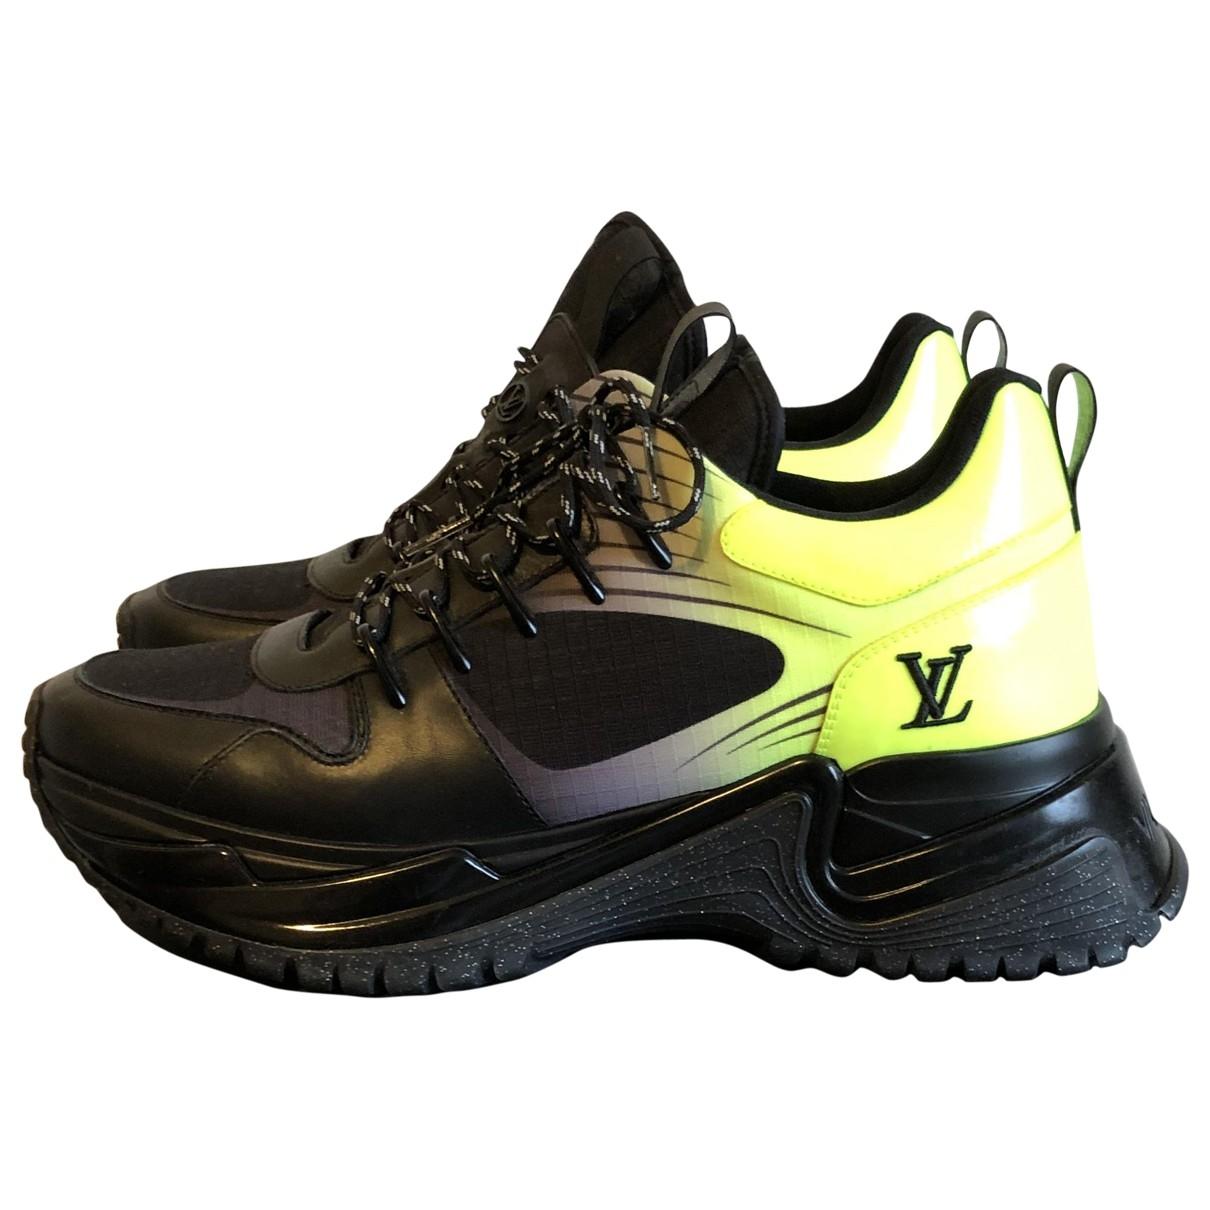 Louis Vuitton \N Sneakers in  Schwarz Leinen